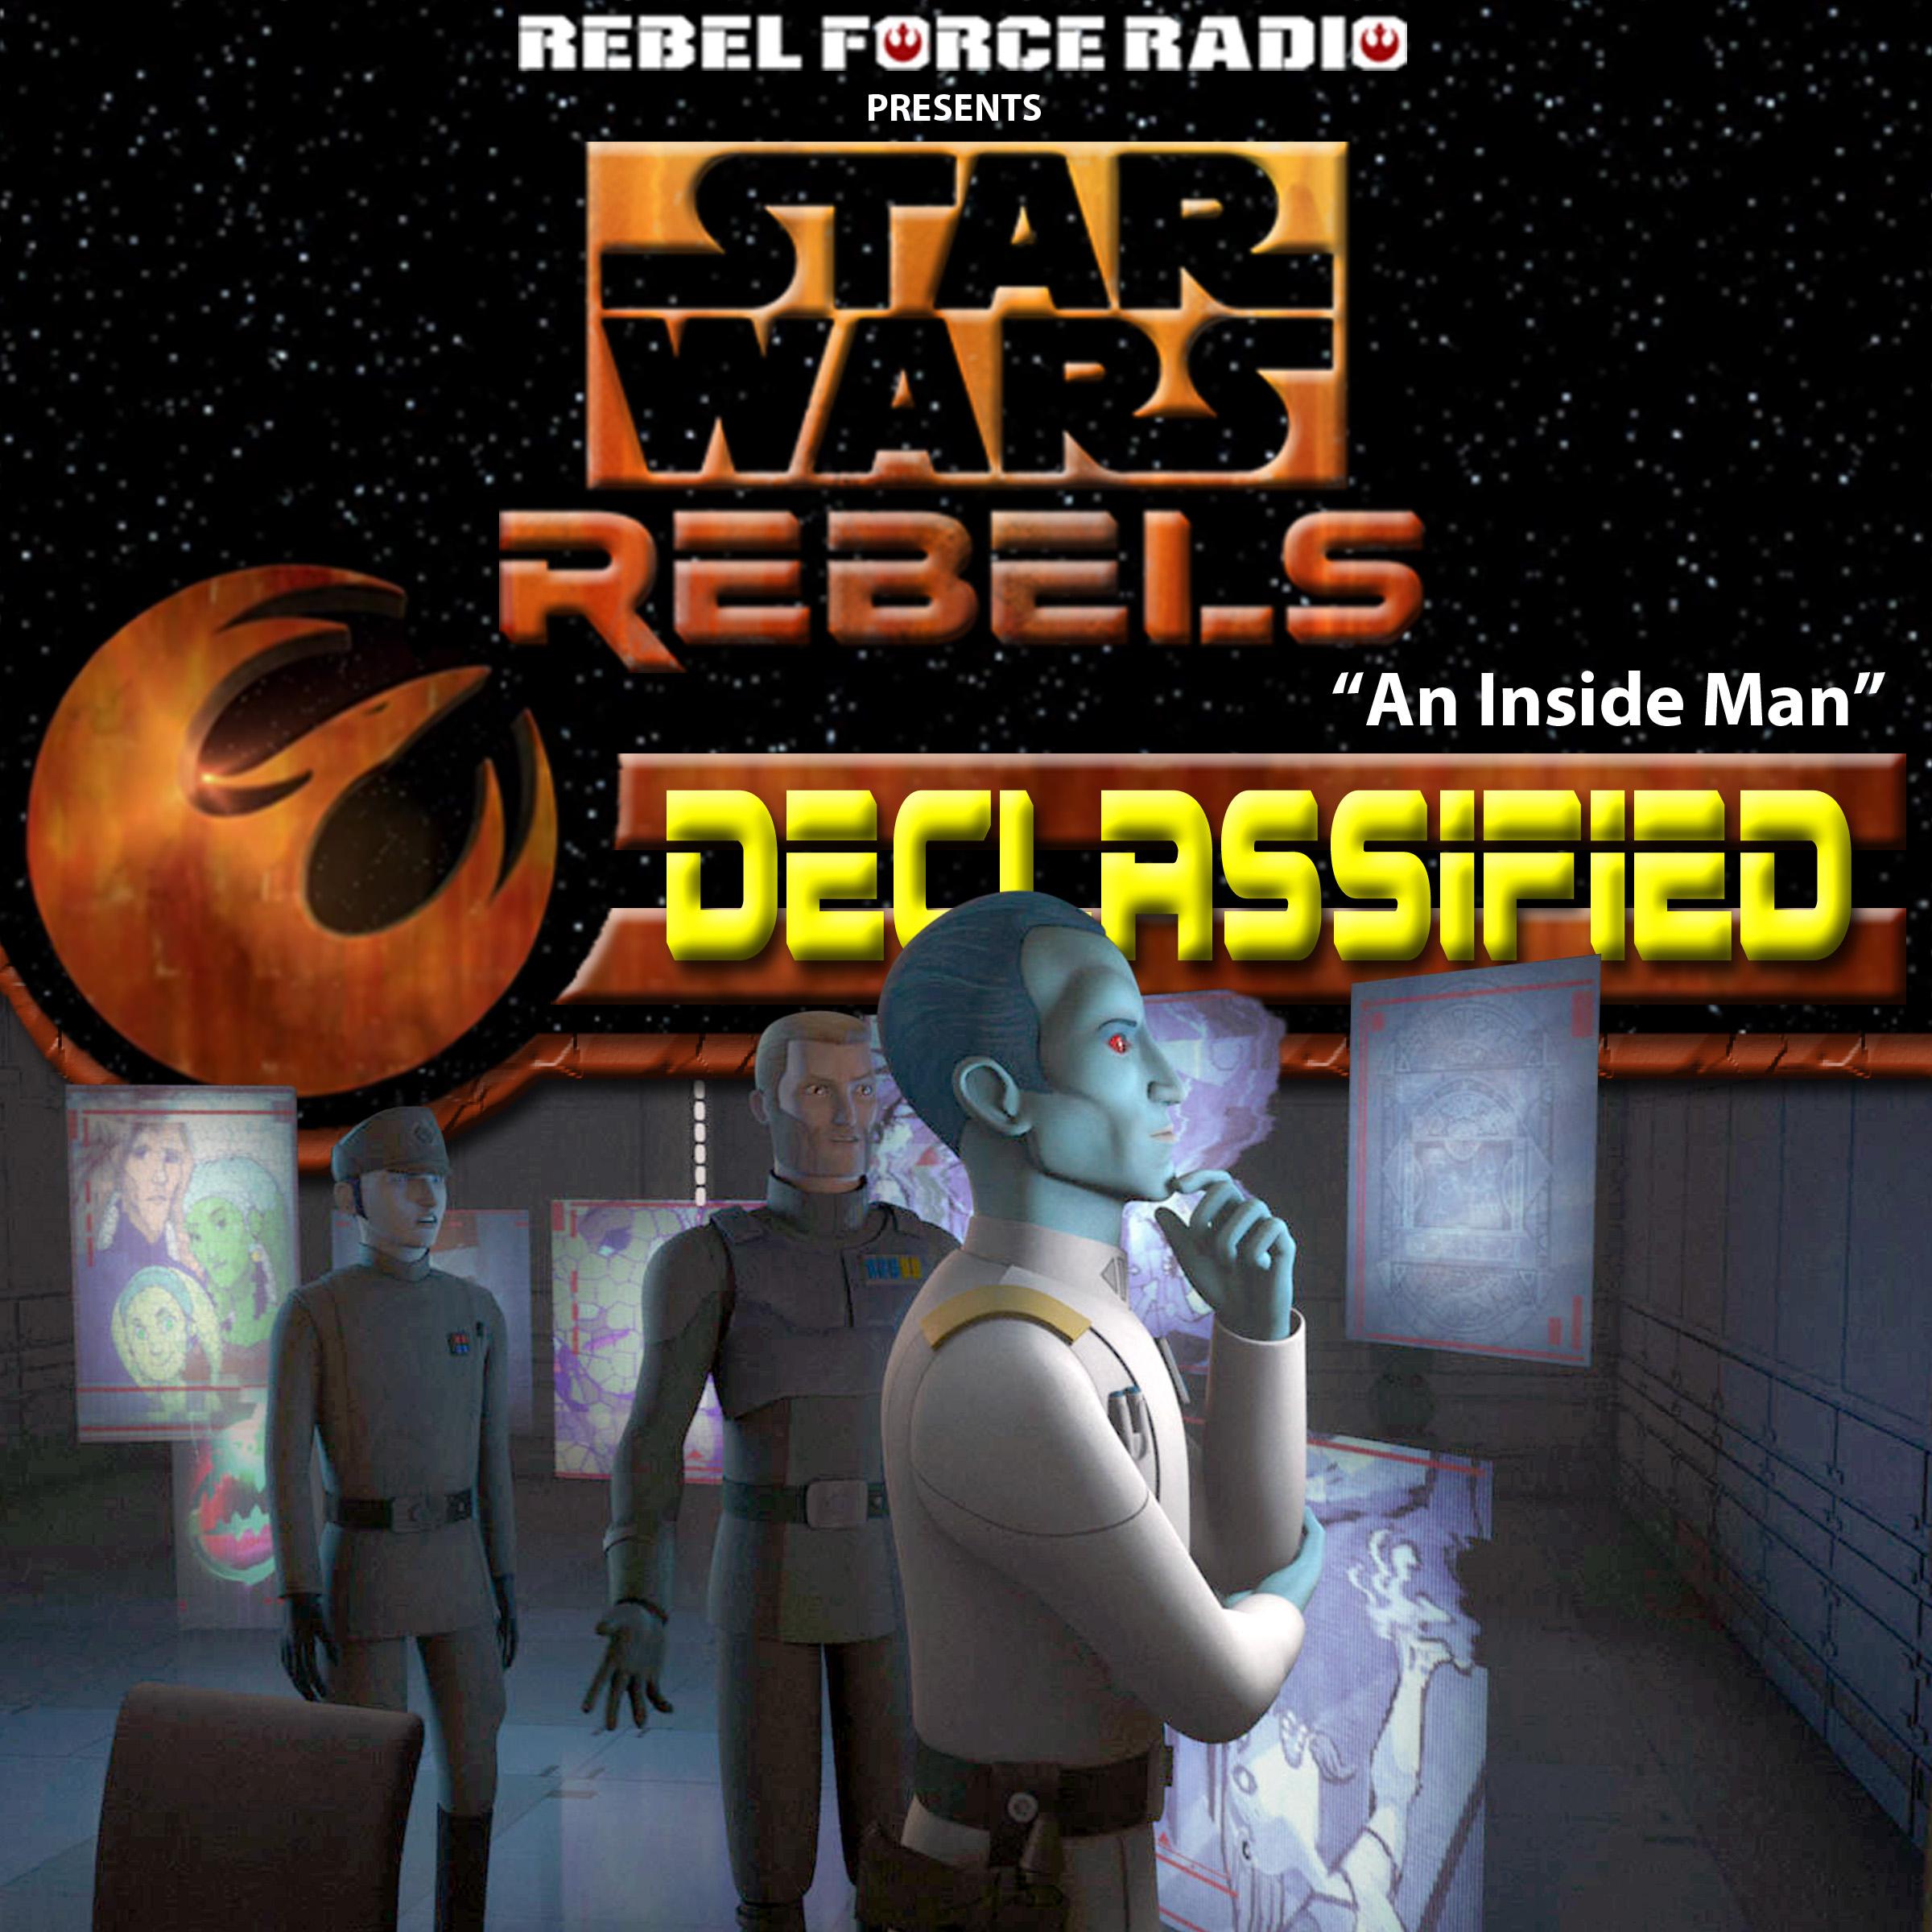 Album_Rebels_Declassified-An_Inside_Man-3.jpg